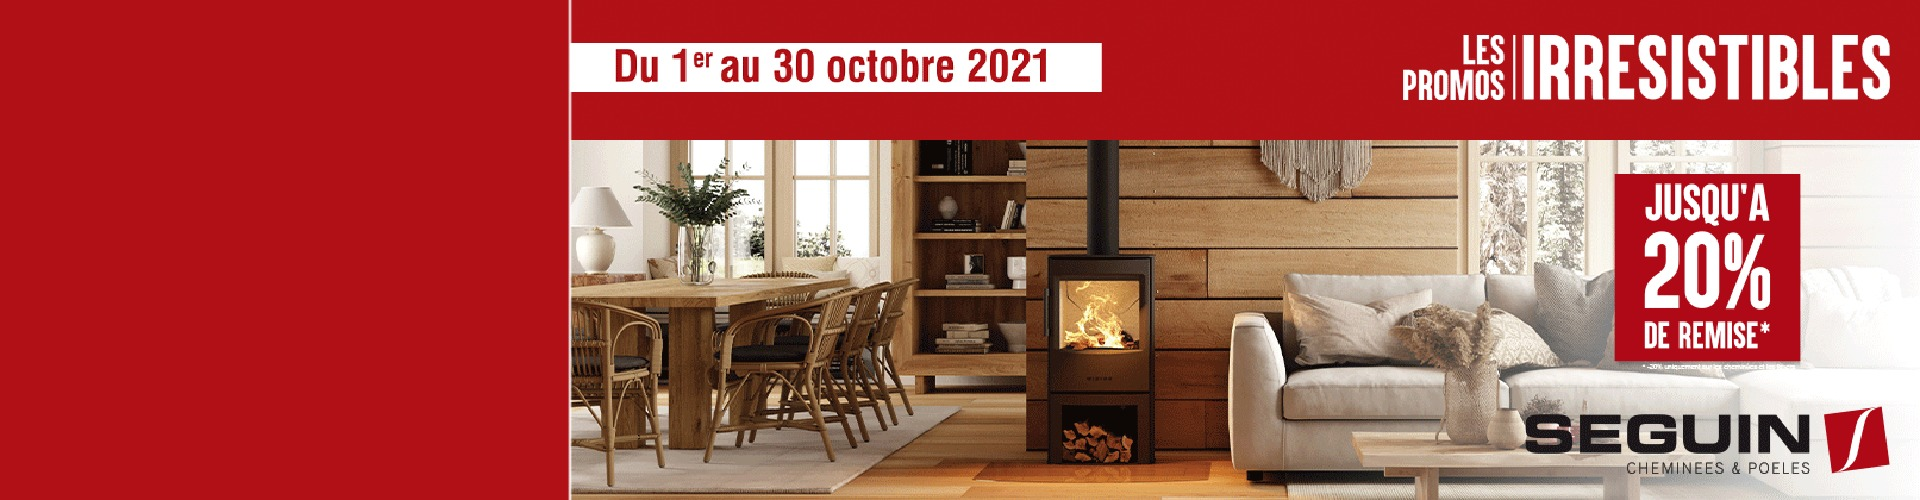 promos-irresistibles-octobre-2021-seguin-91-cheminee-poele-modele-mini-4